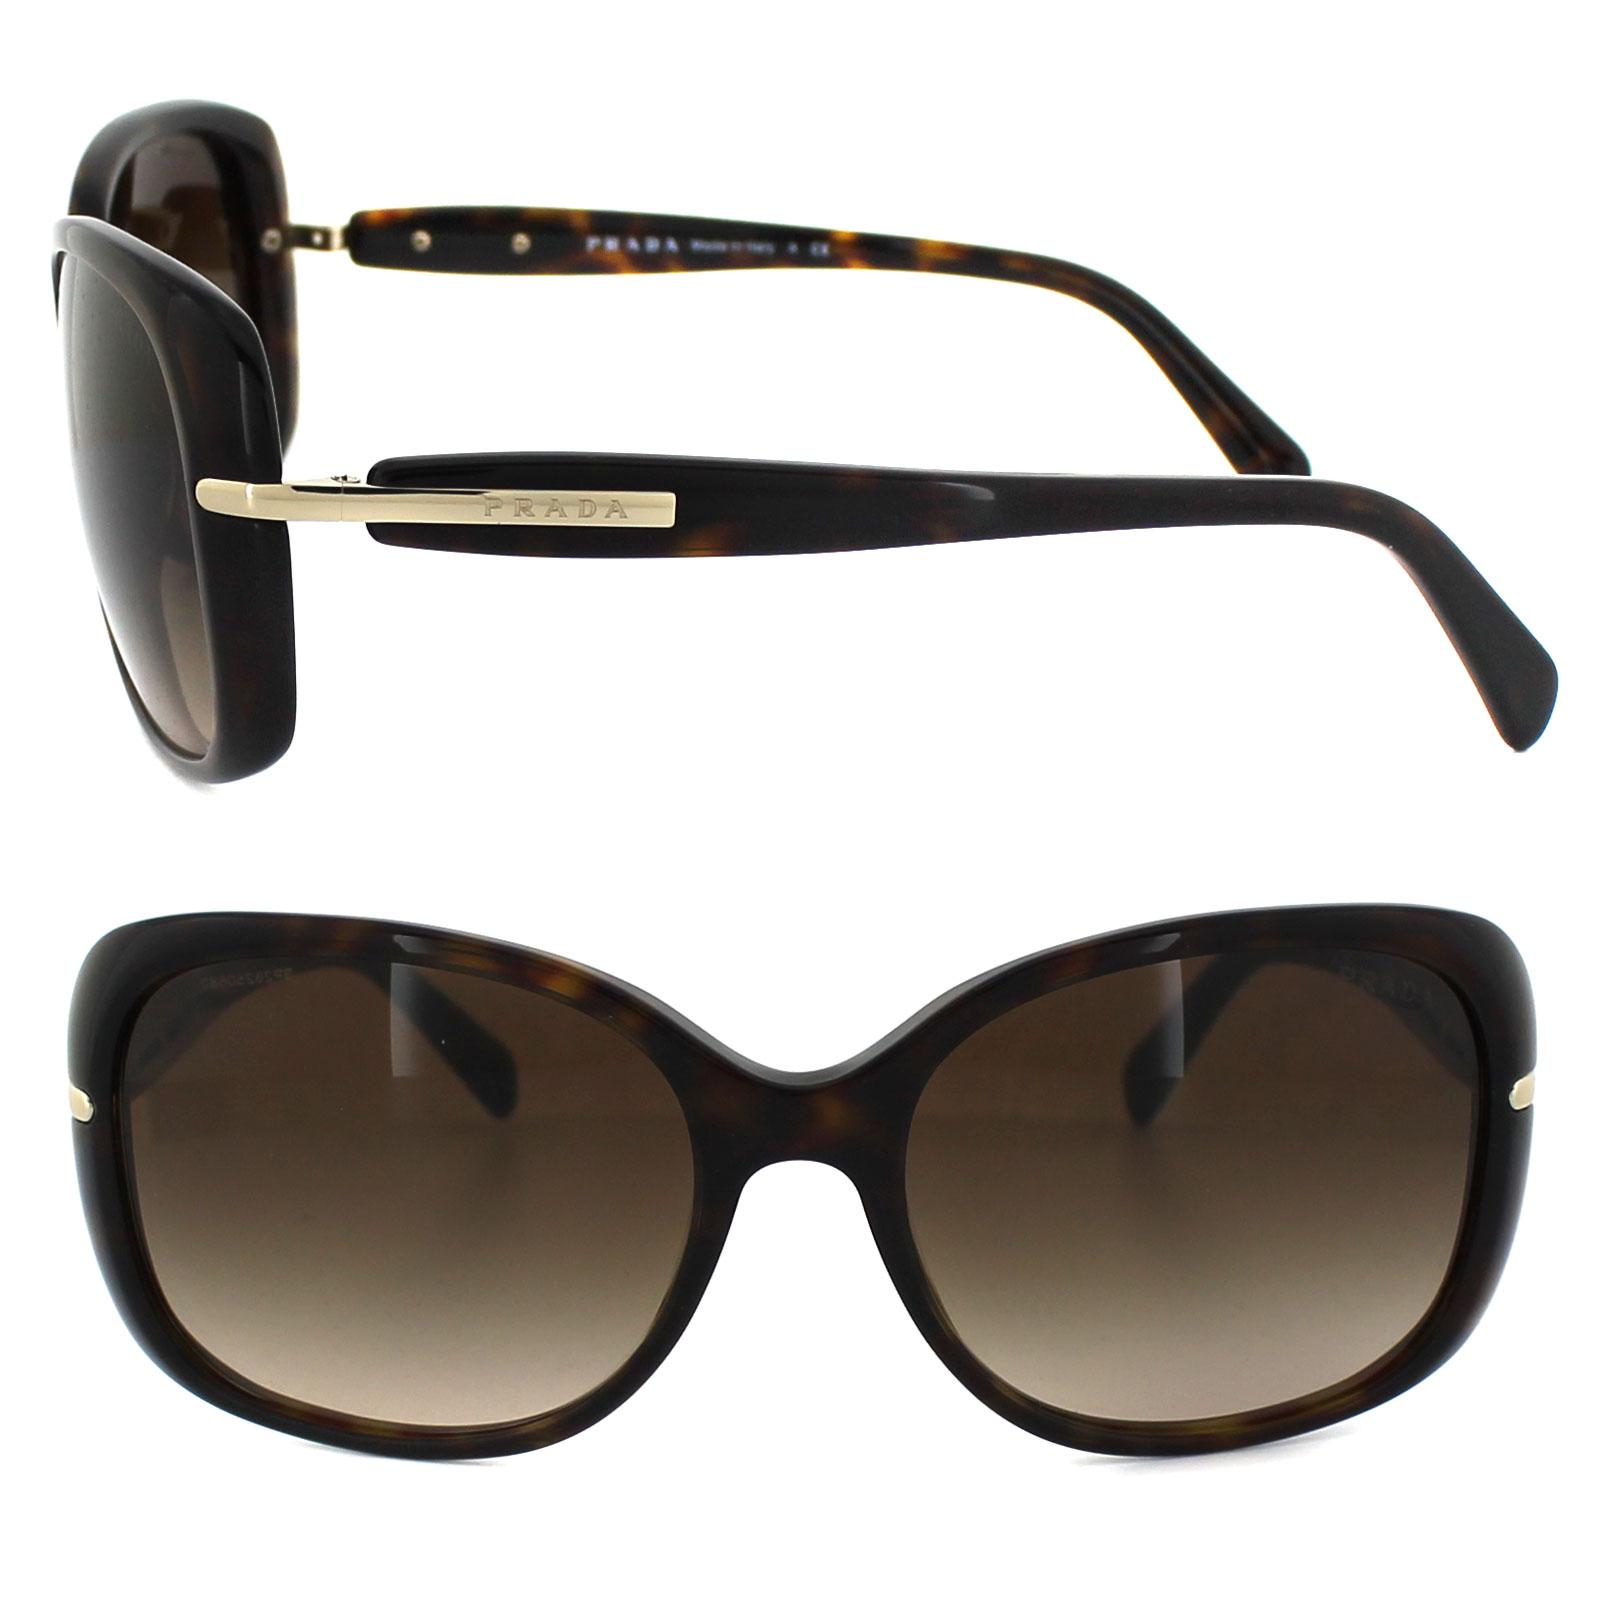 a299aa1111b85 Sentinel Prada Sunglasses 08OS 2AU6S1 Havana Brown Gradient